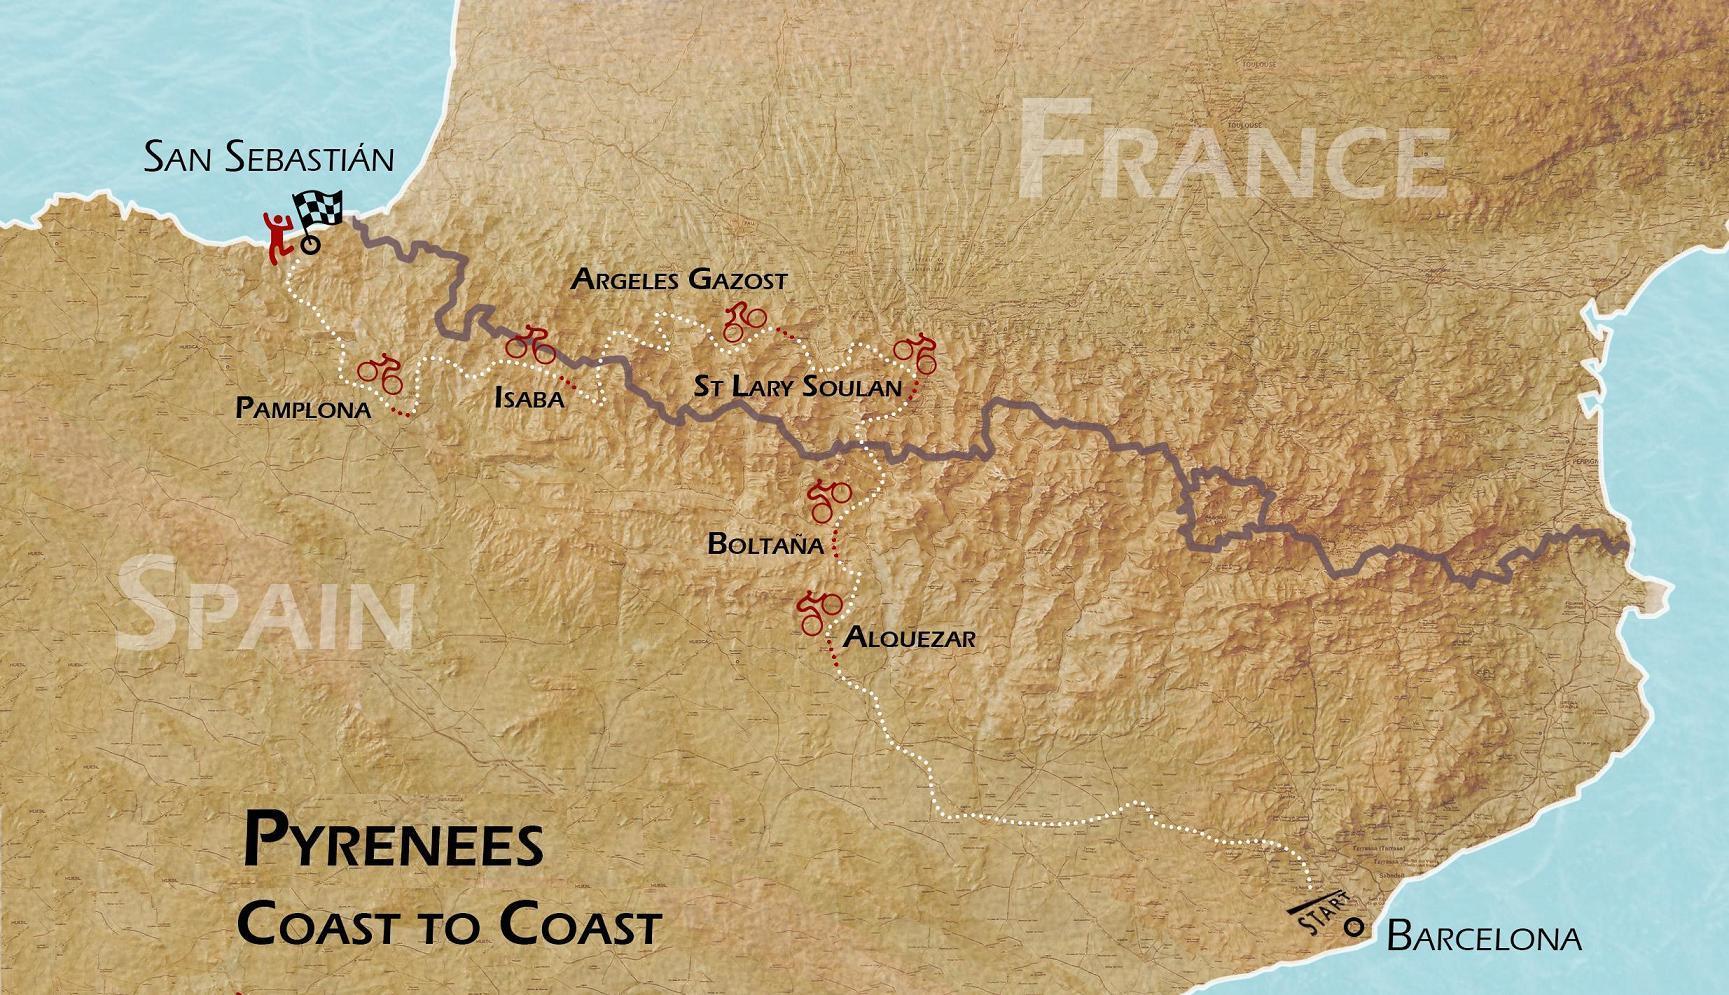 Pyrenees Coast 2 Coast Cycling Tour